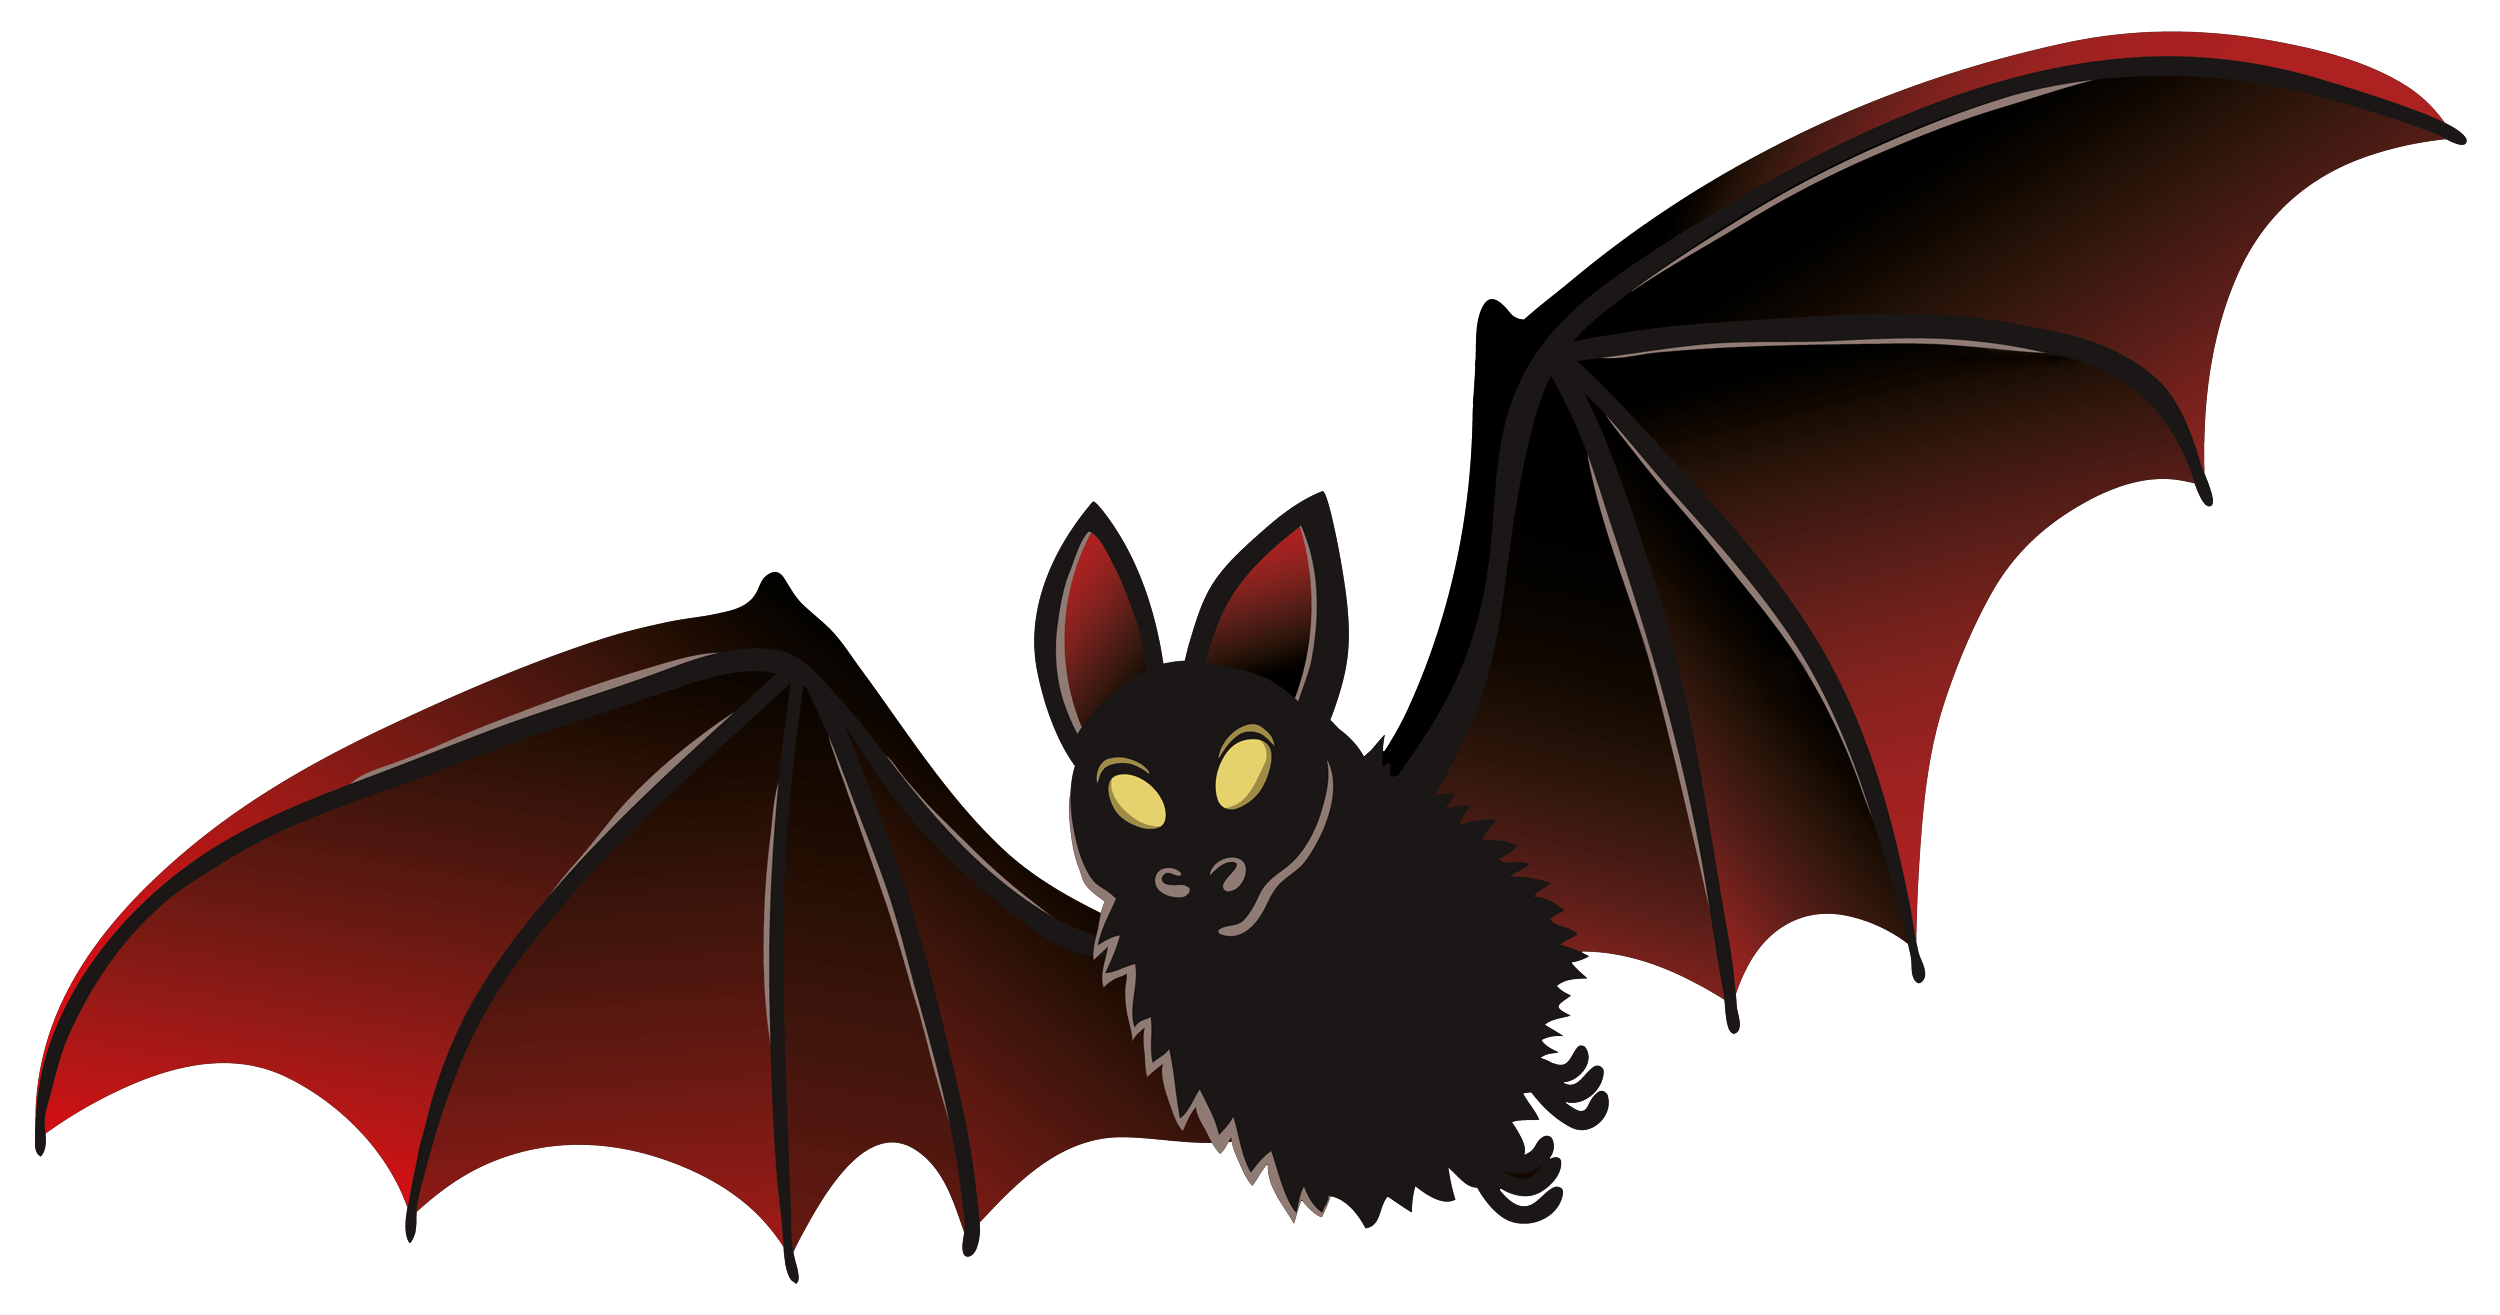 Dark bat transparent png. Lips clipart vampire